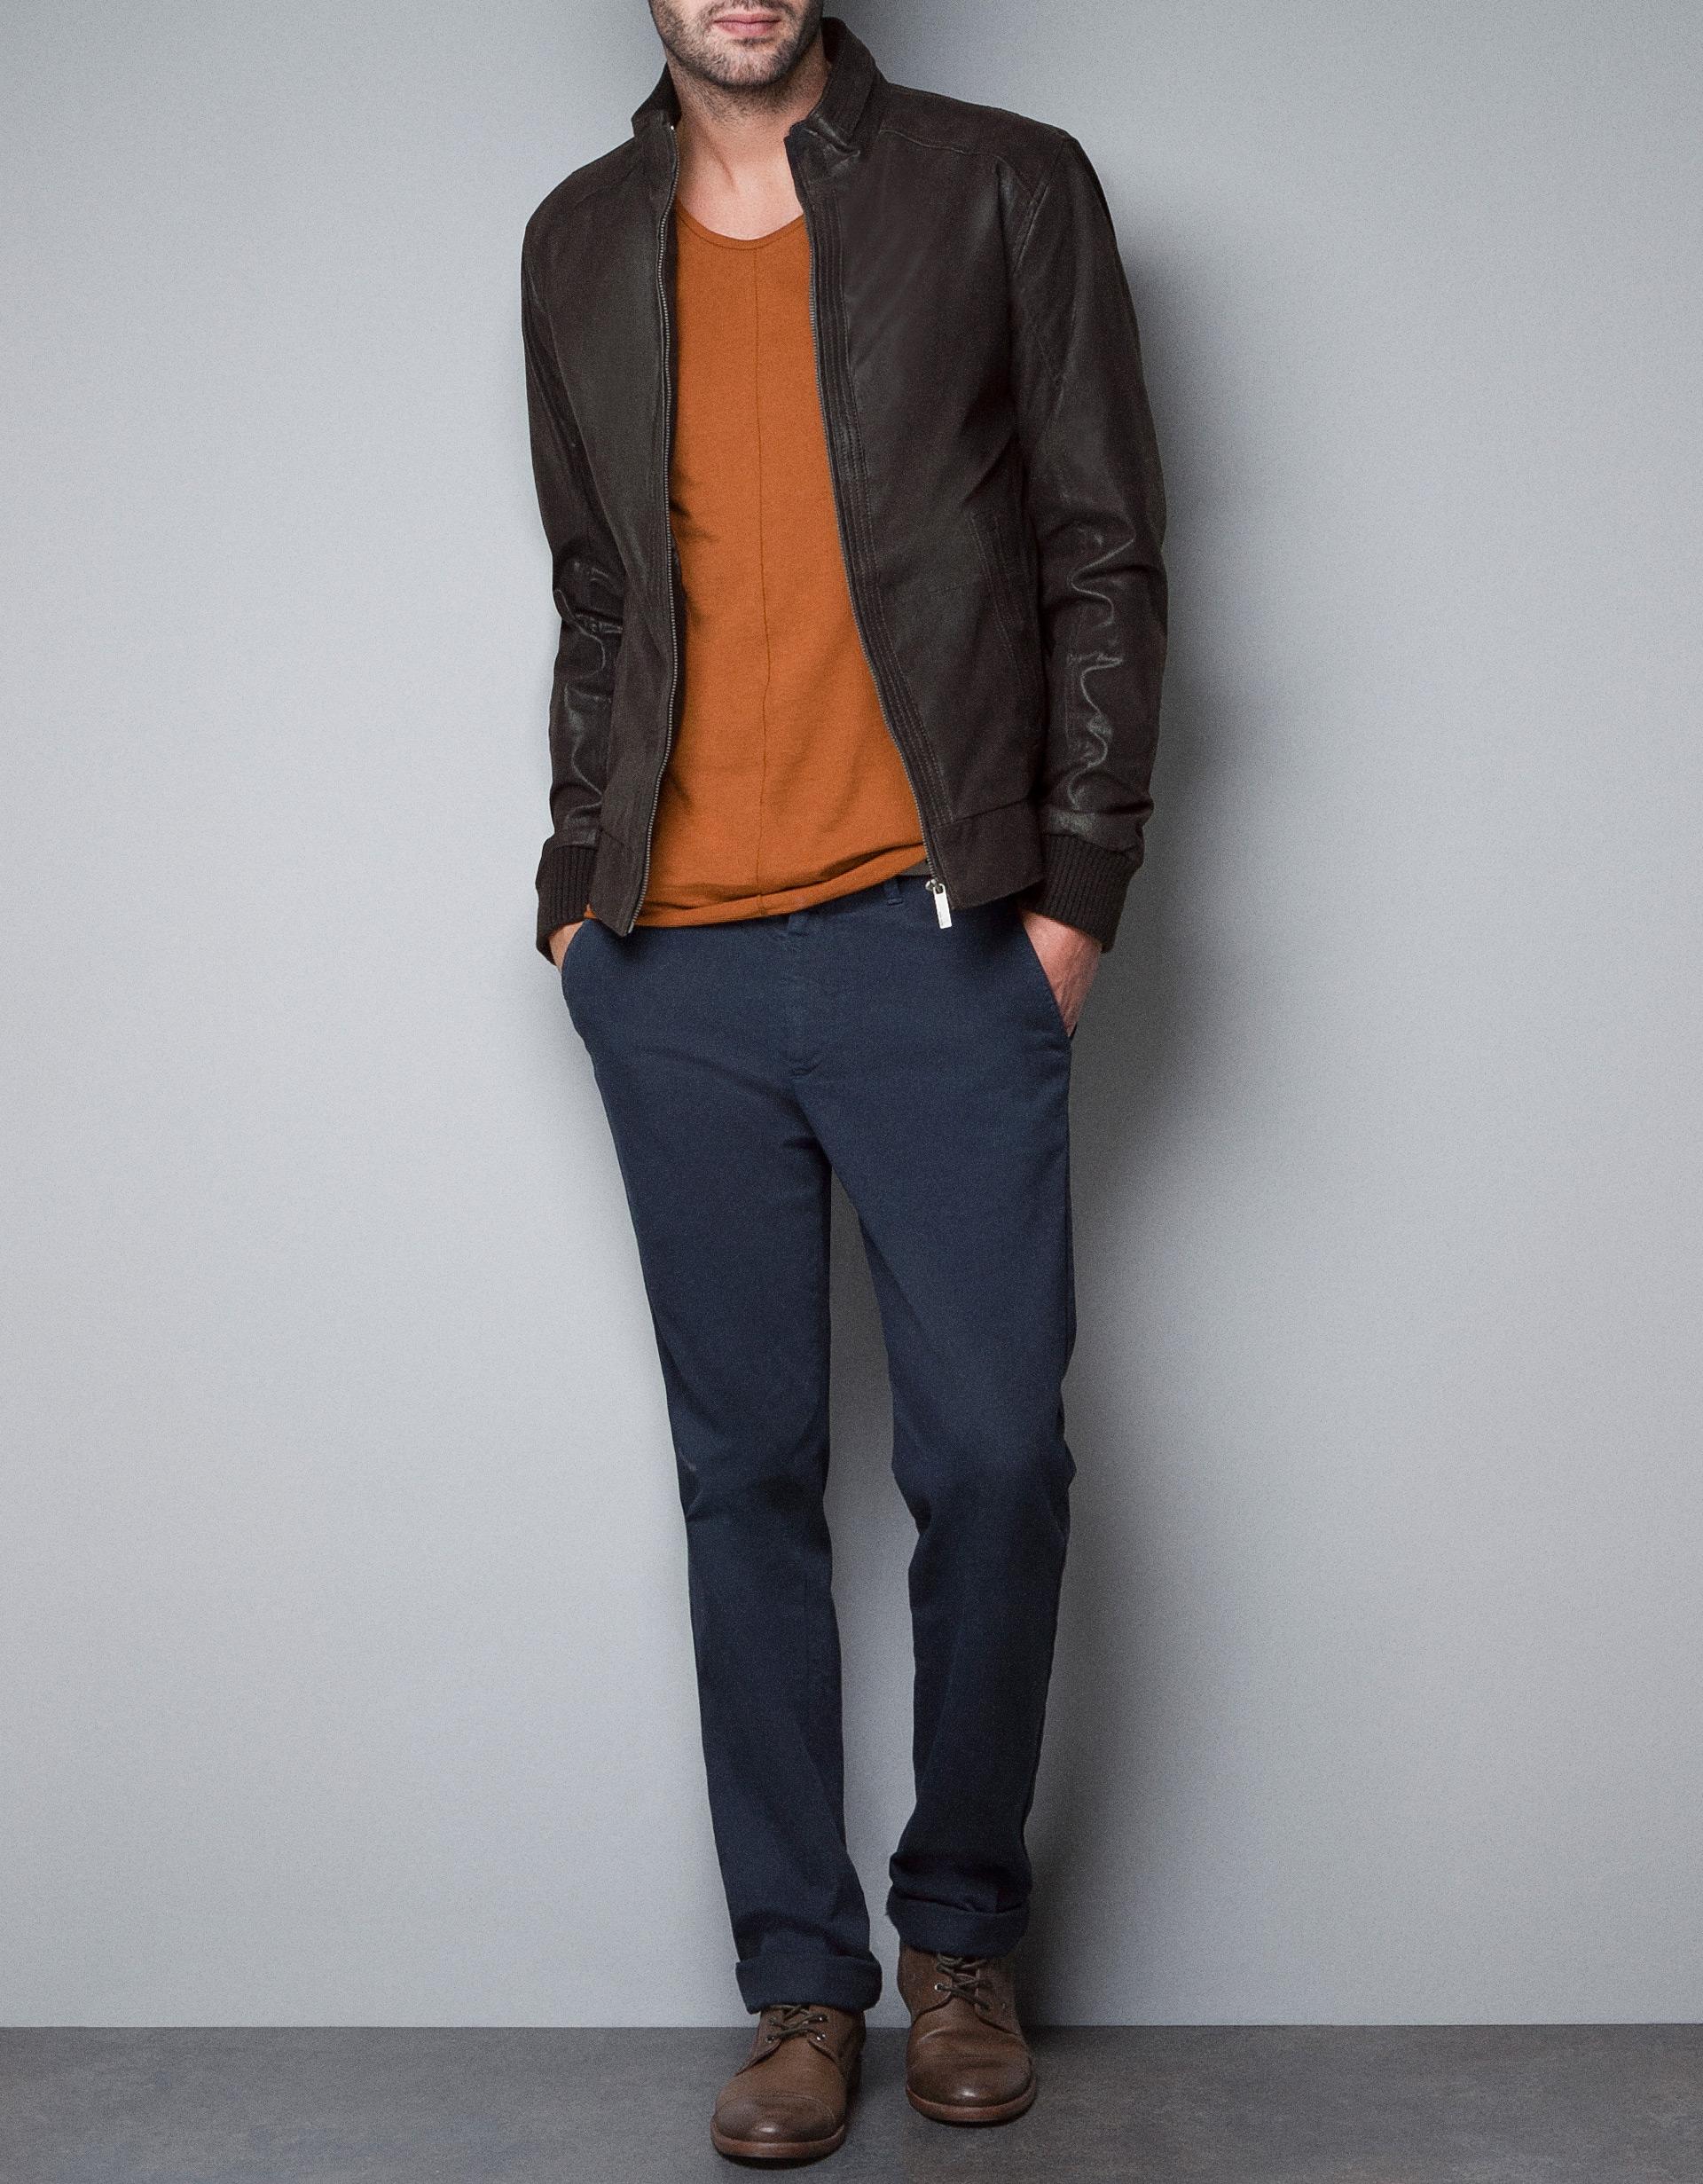 Leather jacket yellow zara - Zara Leather Jacket In Brown For Men